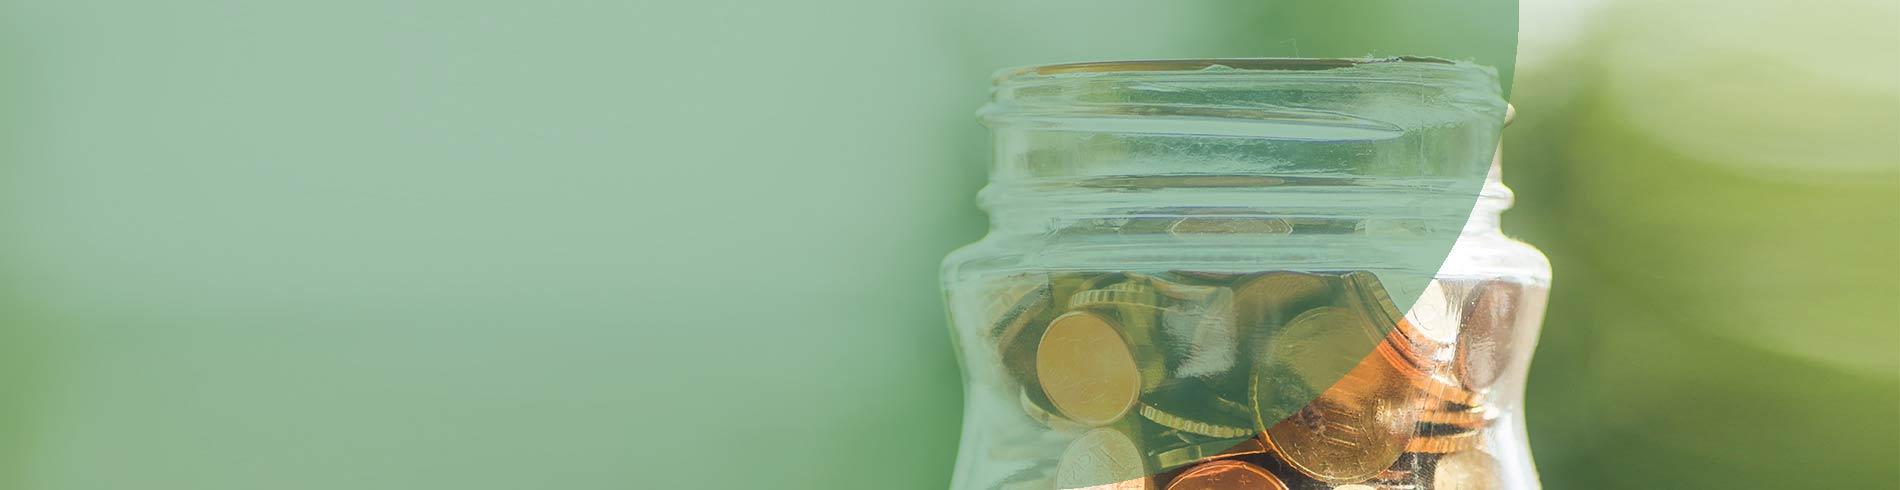 SIALP: Plan de ahorro a largo plazo